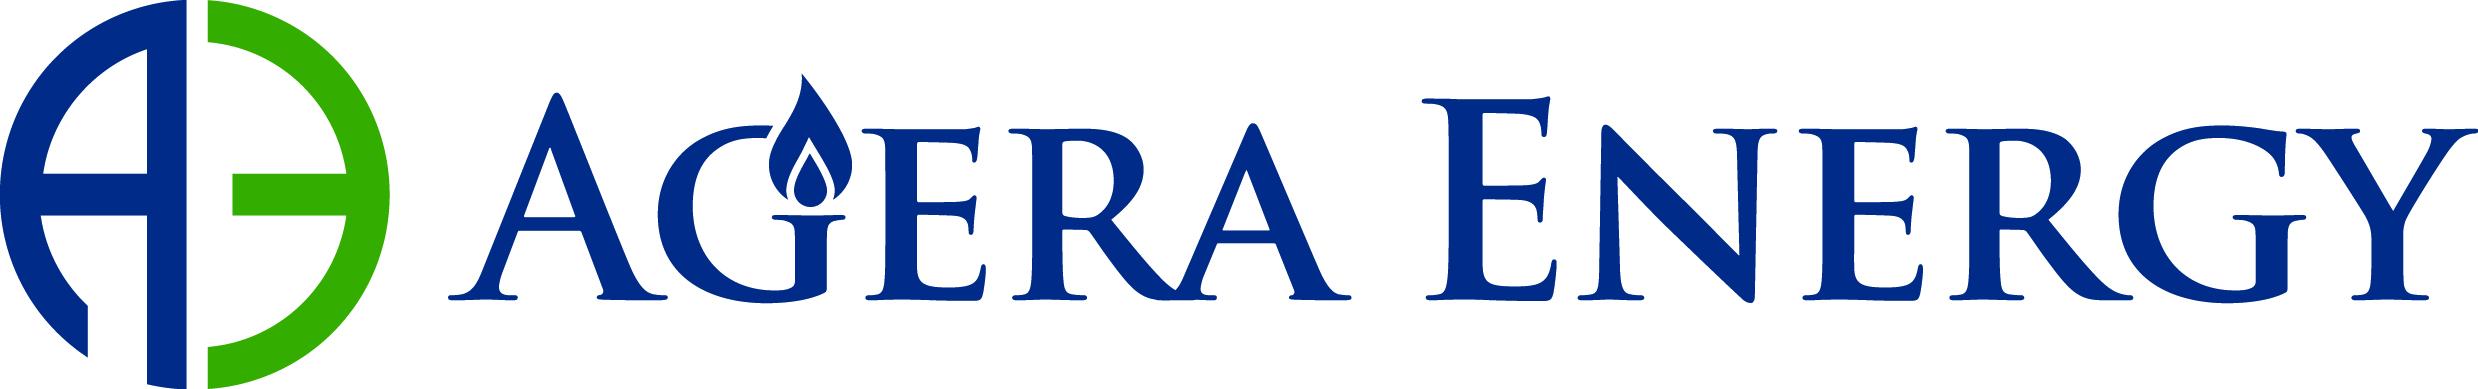 Agera Energy